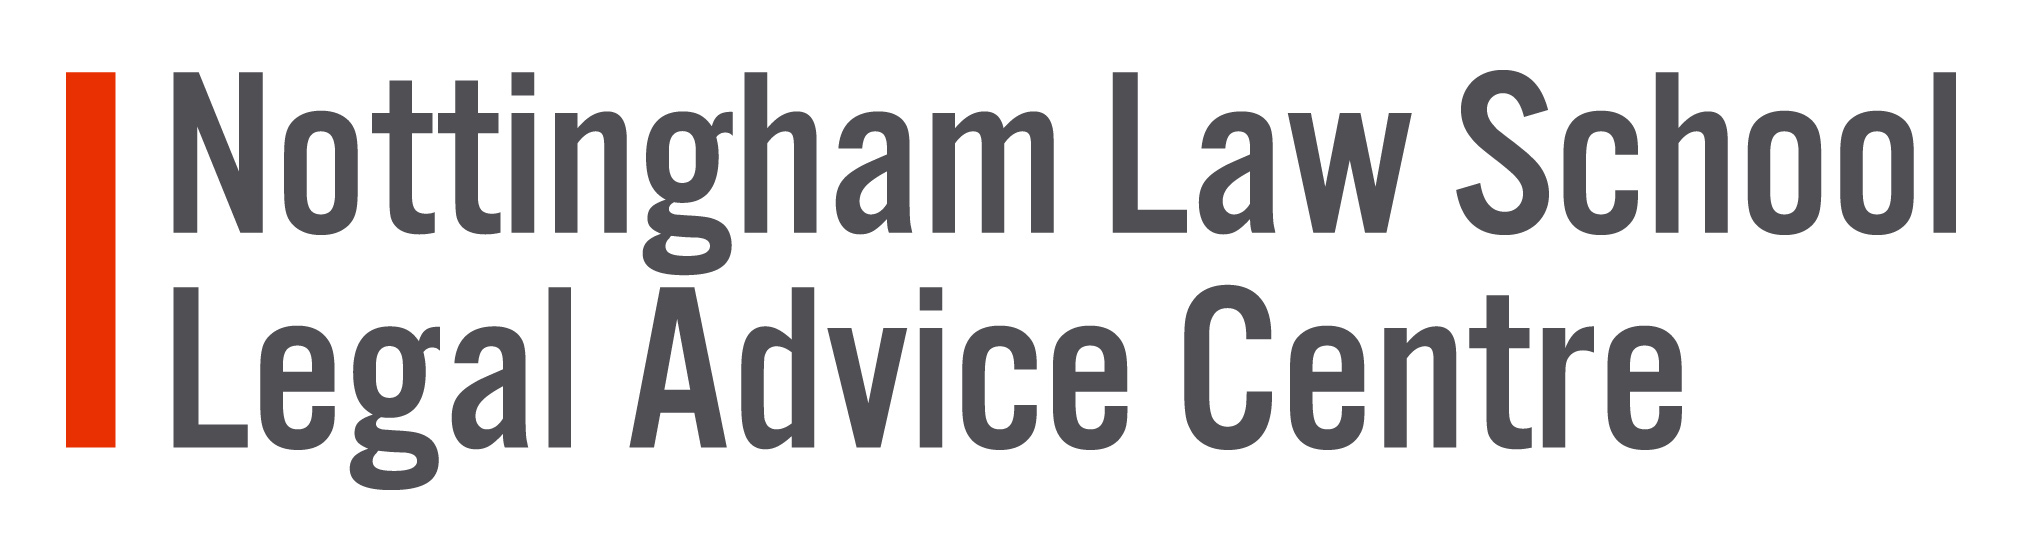 Legal Advice Centre logo